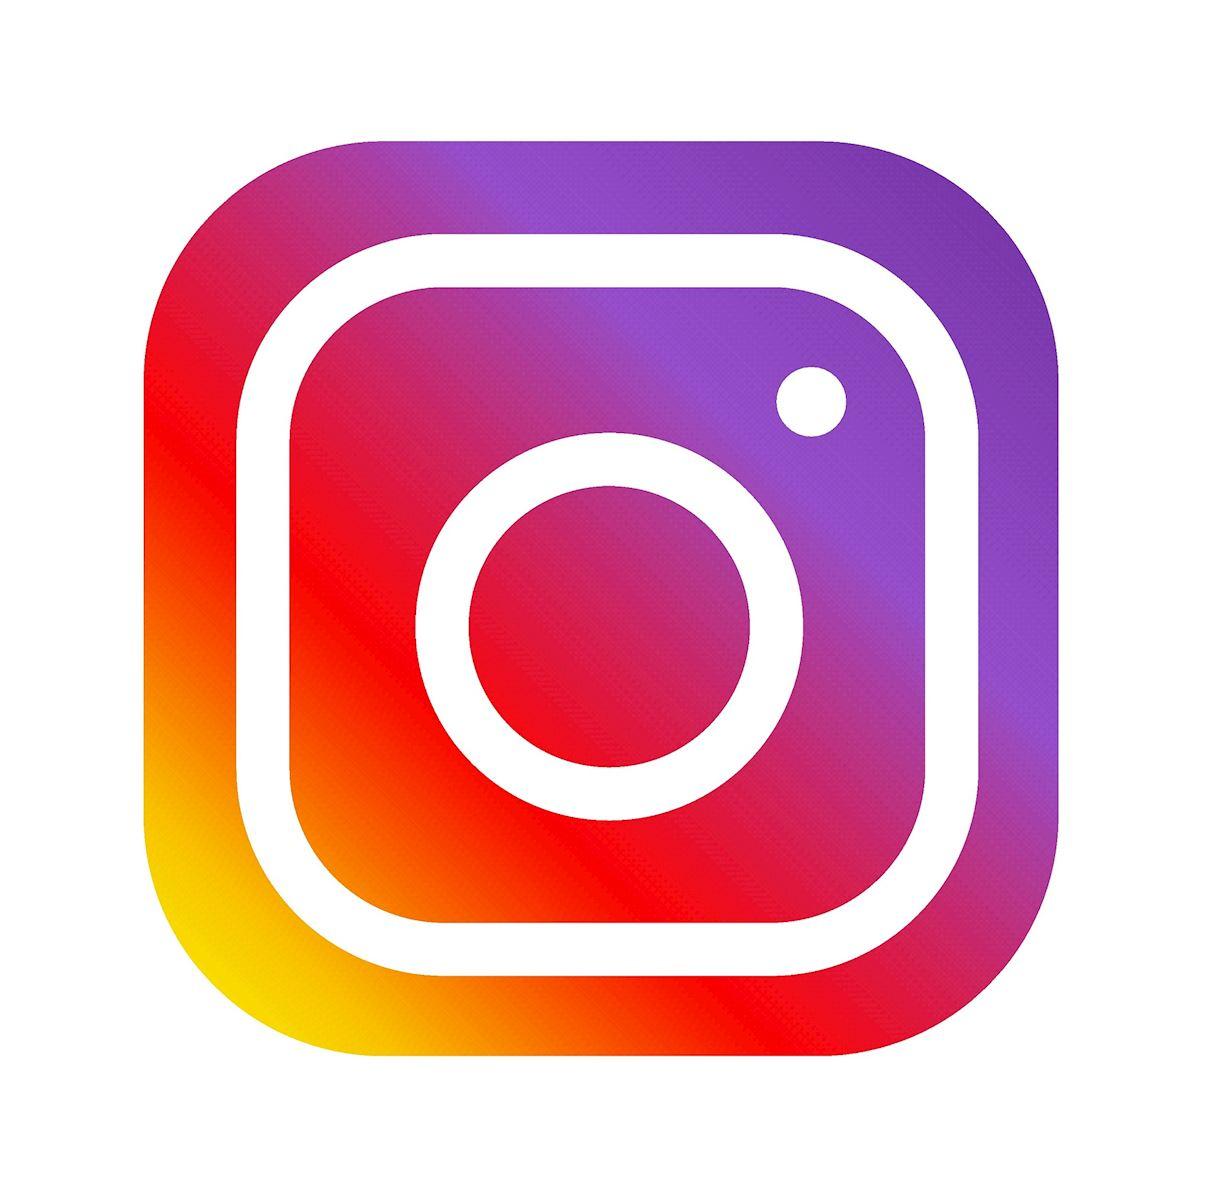 Dacorum Triathlon Club Instagram page